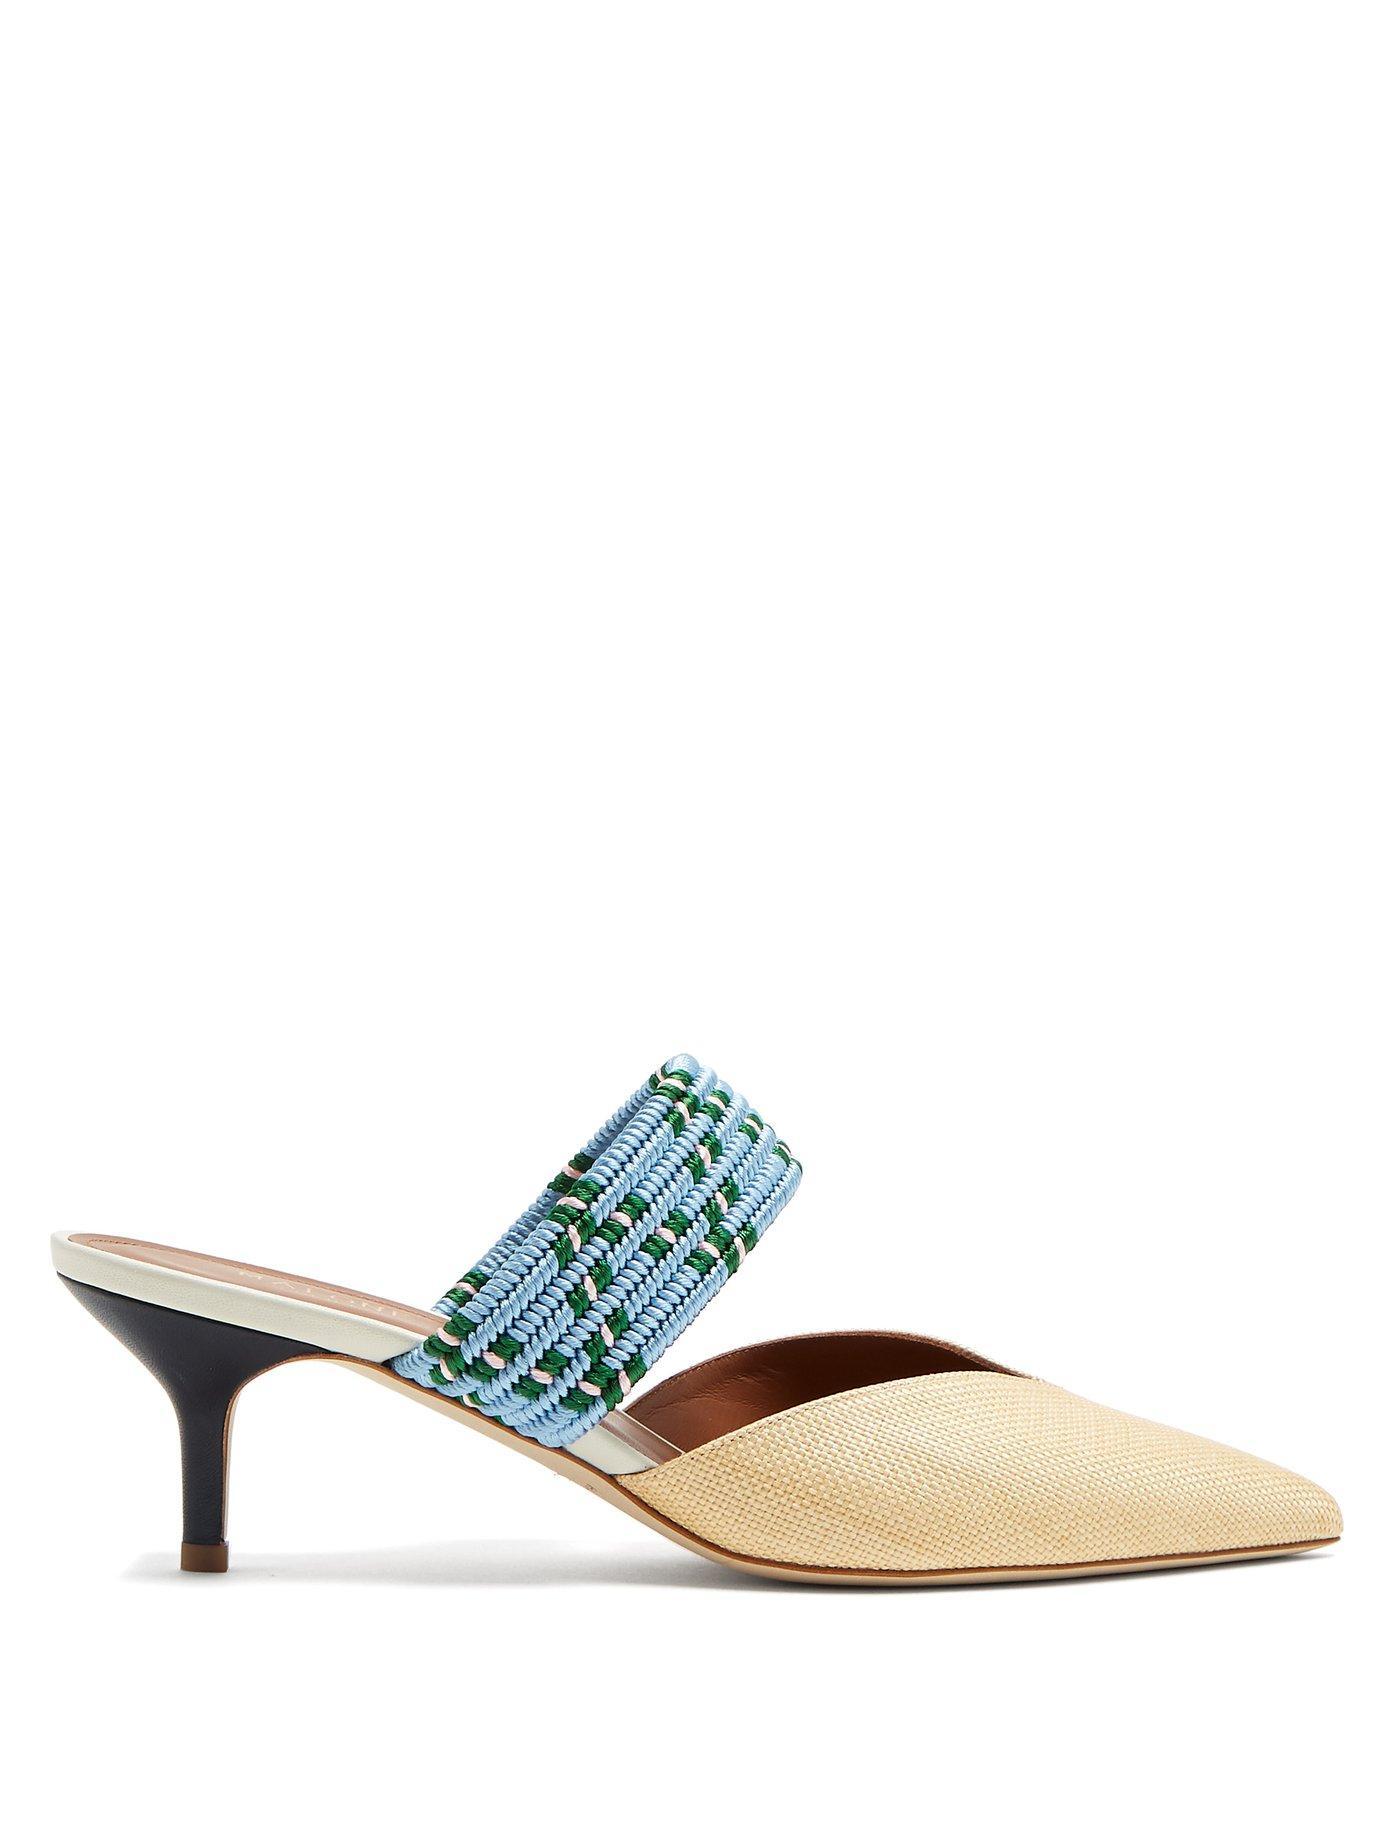 Malone Souliers Masie Raffia Heeled Mules In Oatmeal/light Blue/white